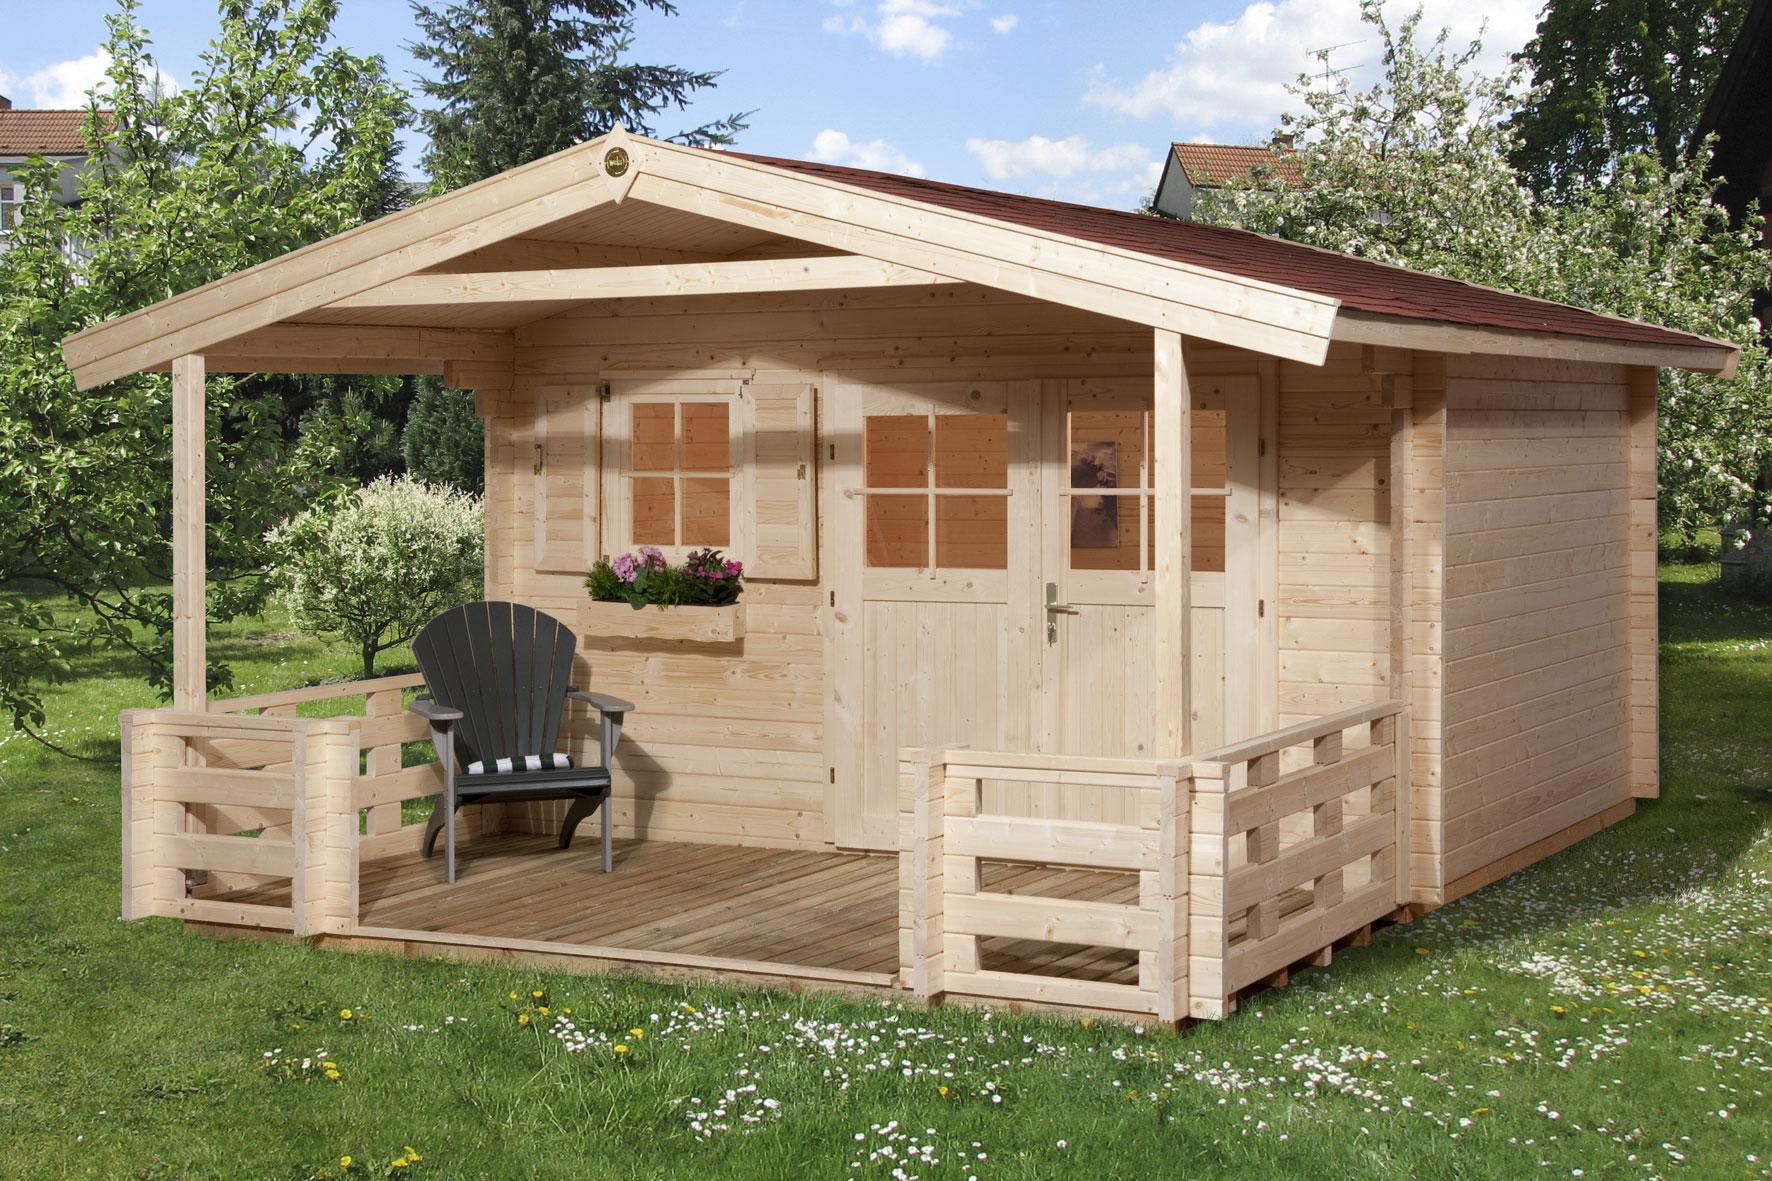 weka blockbohlenhaus 45 mm gartenhaus 136b gr 1 natur 460x510cm bei. Black Bedroom Furniture Sets. Home Design Ideas